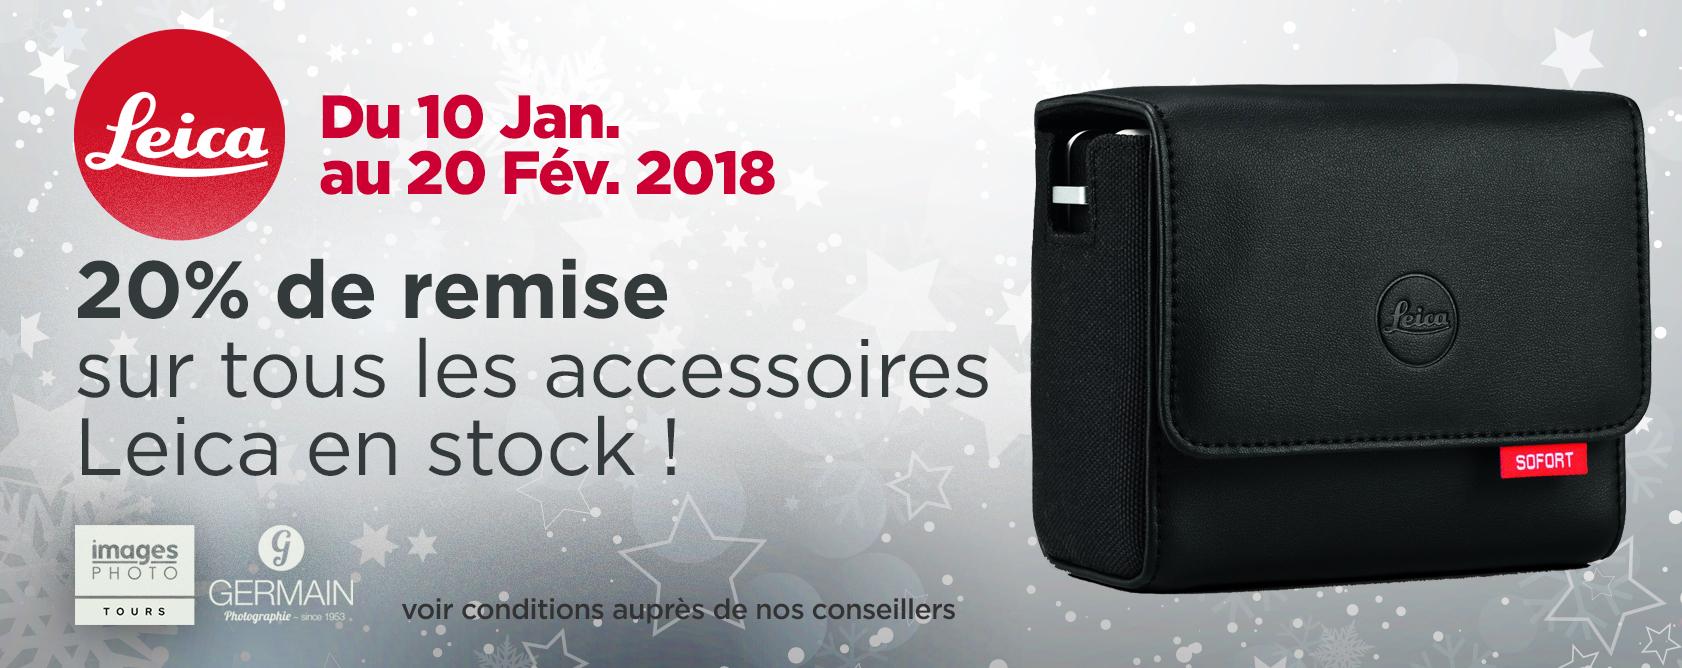 Leica accessoires 20 fev